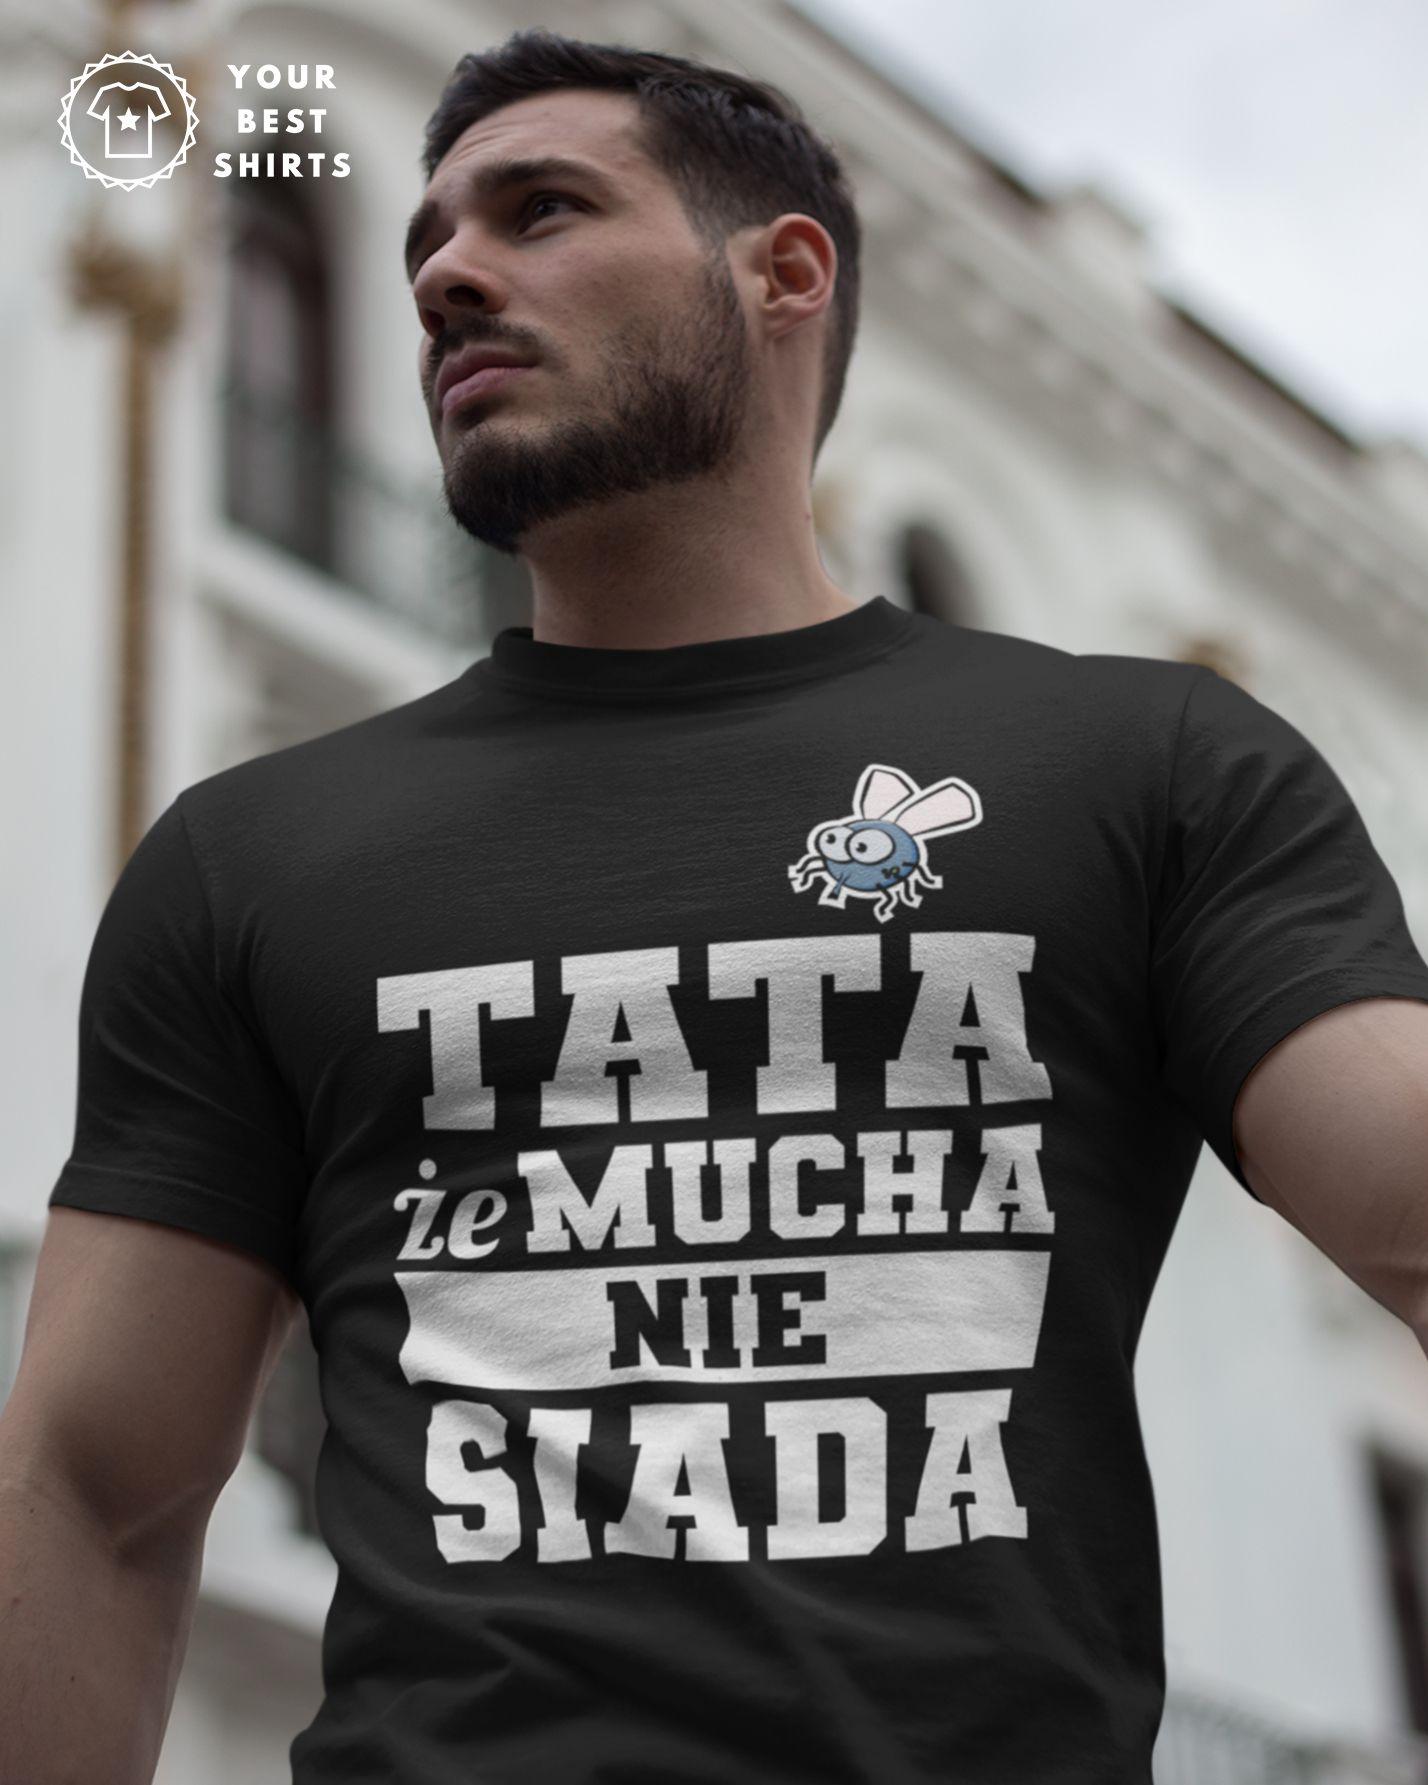 Koszulka Dla Taty Tata Ze Mucha Nie Siada In 2020 Cool Shirts Mens Tops Mens Tshirts